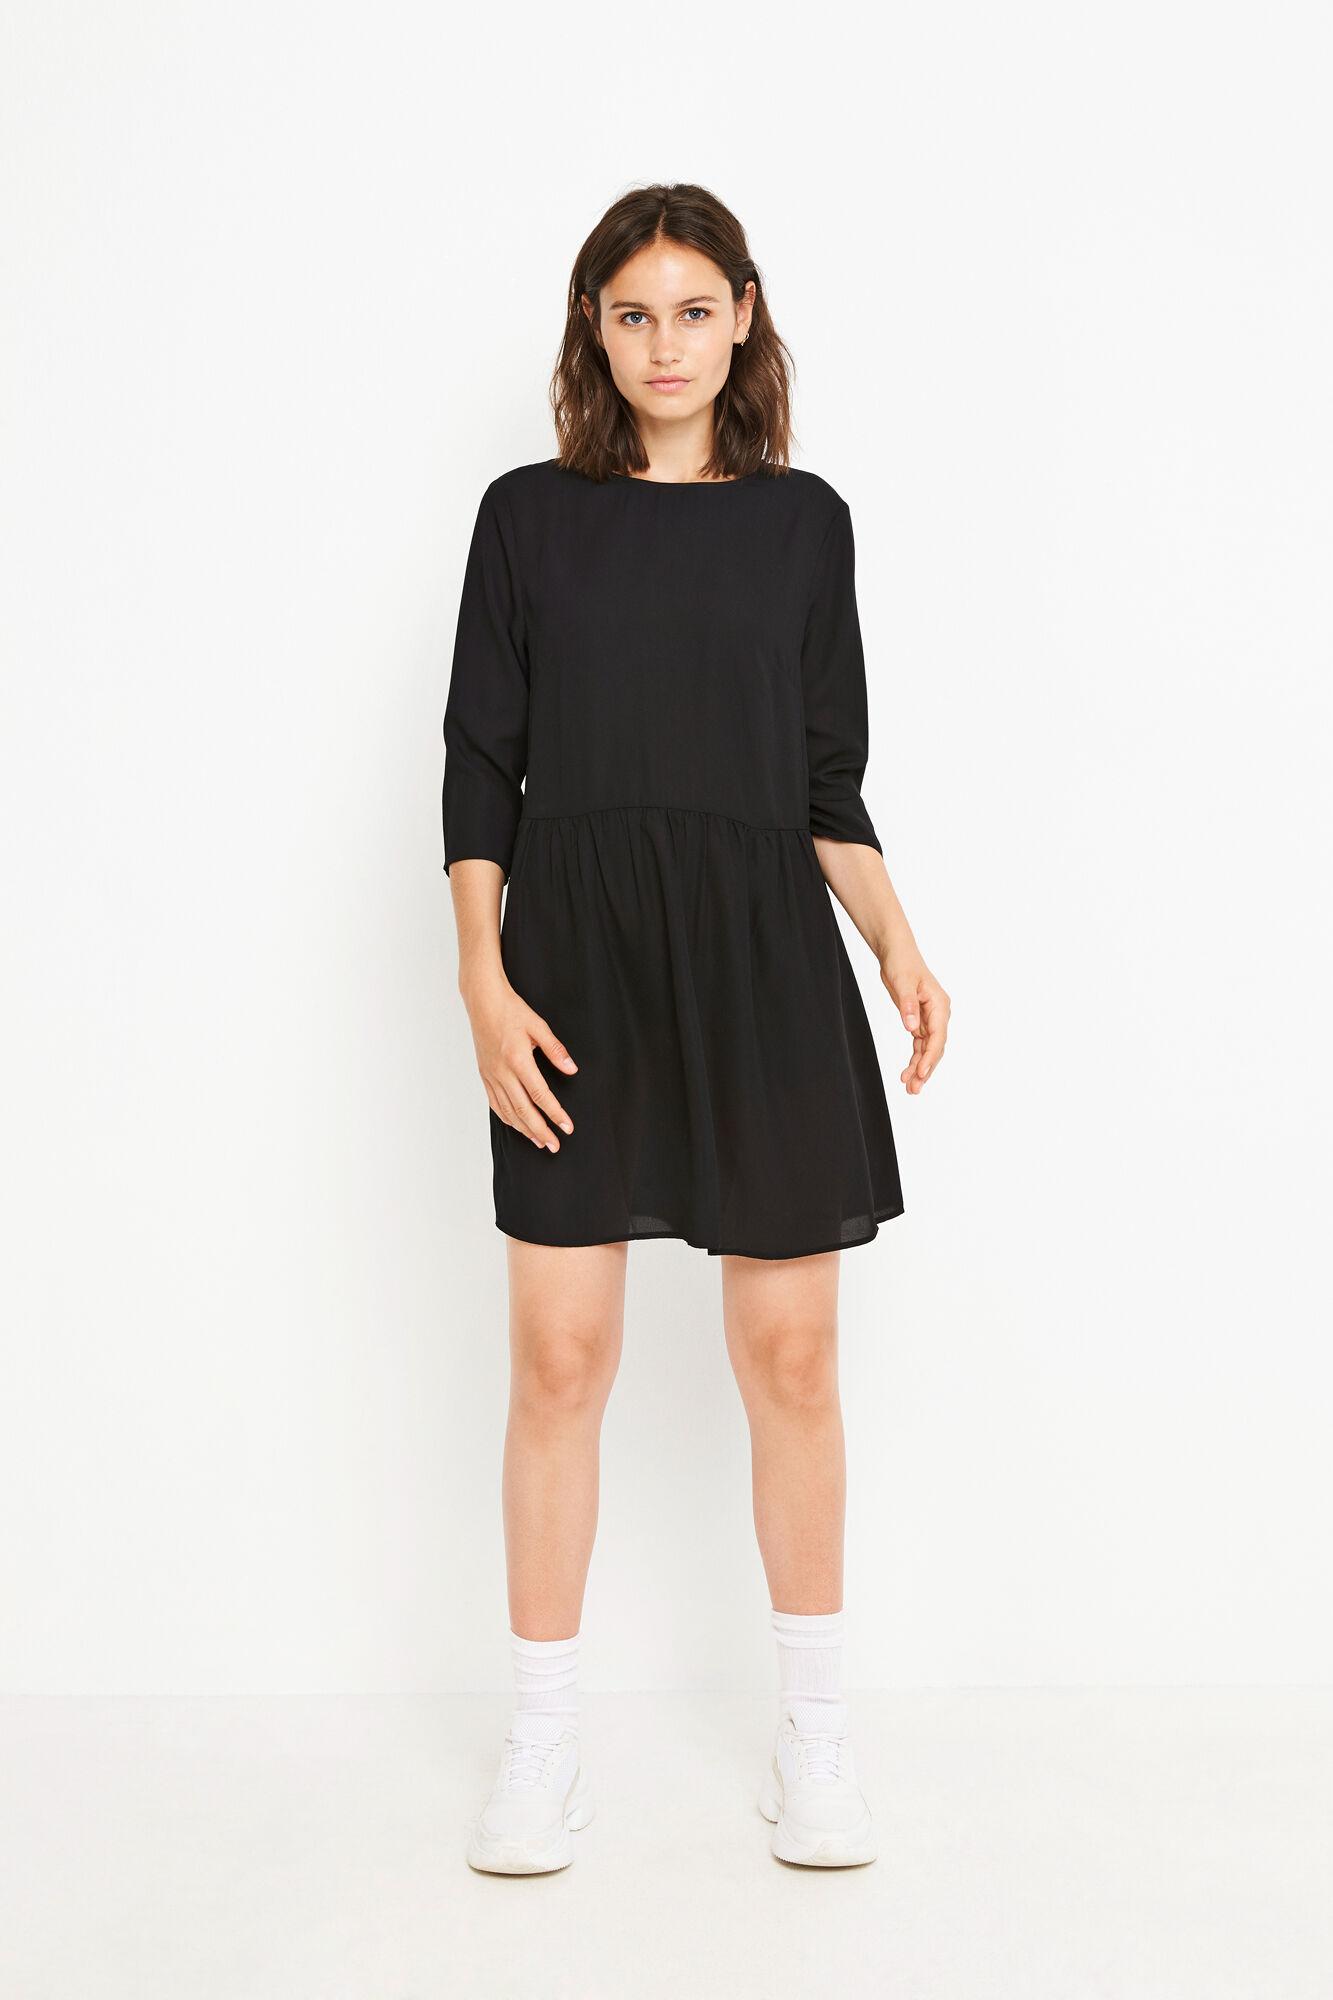 ENMOORE 3/4 DRESS 6465